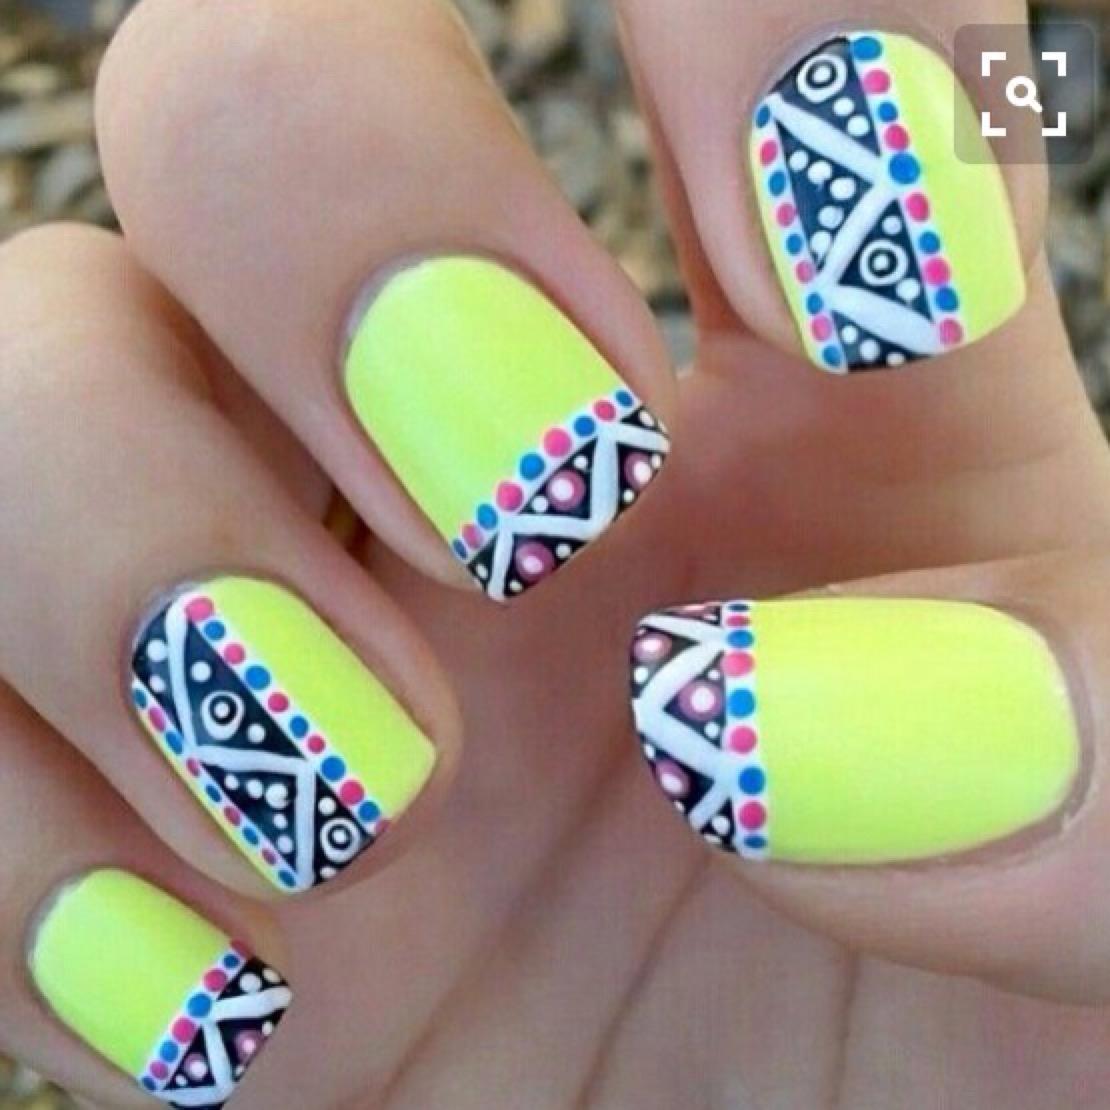 Neon Yellow And Tribal Print Nail Art Design